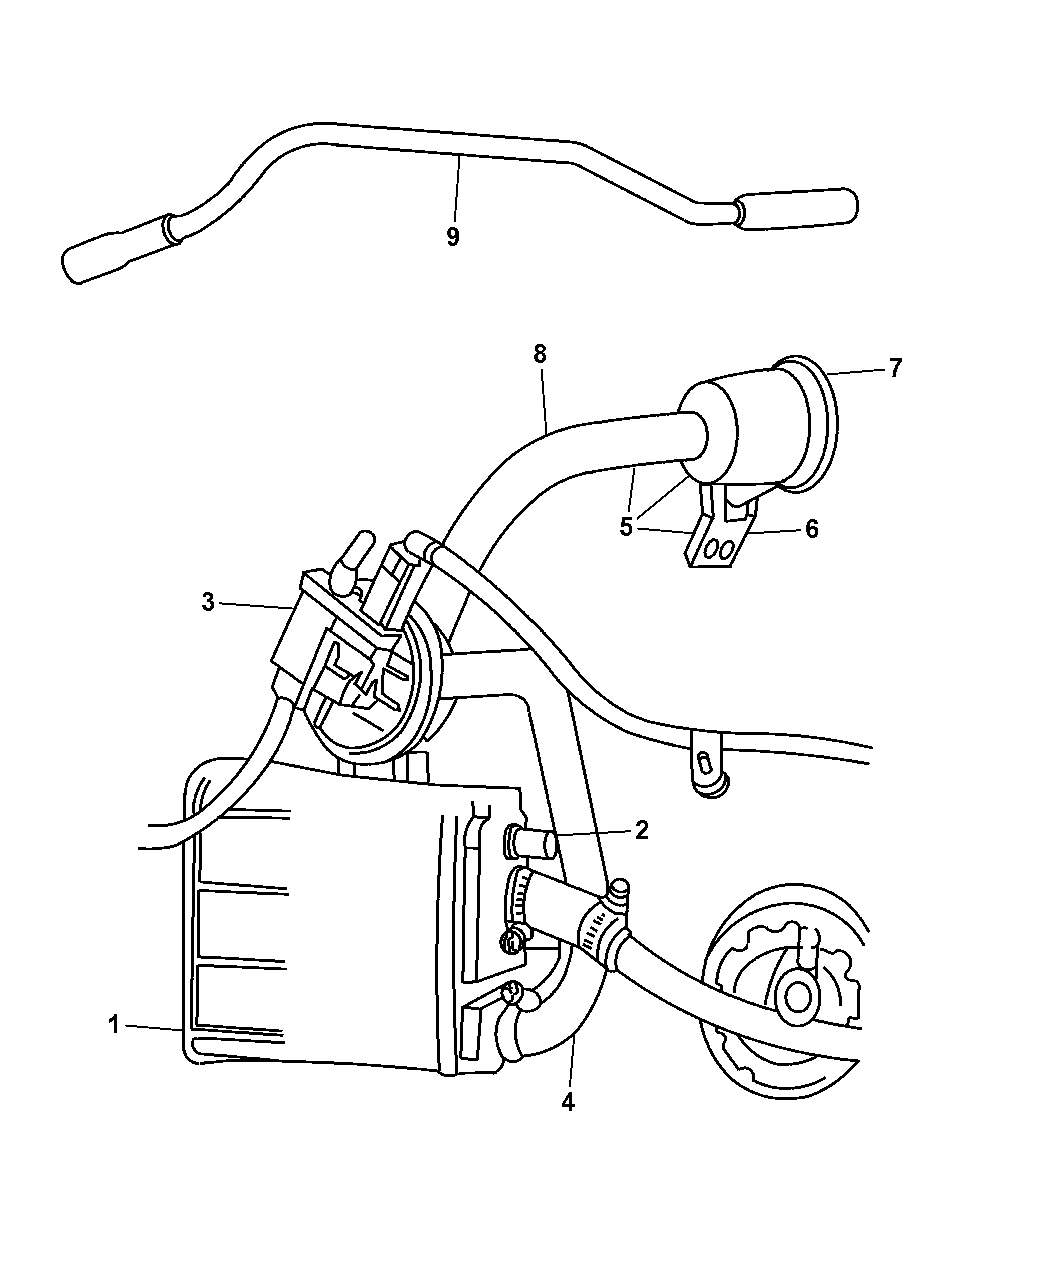 2001 Dodge Stratus Sedan Vacuum Canister & Leak Detection Pump